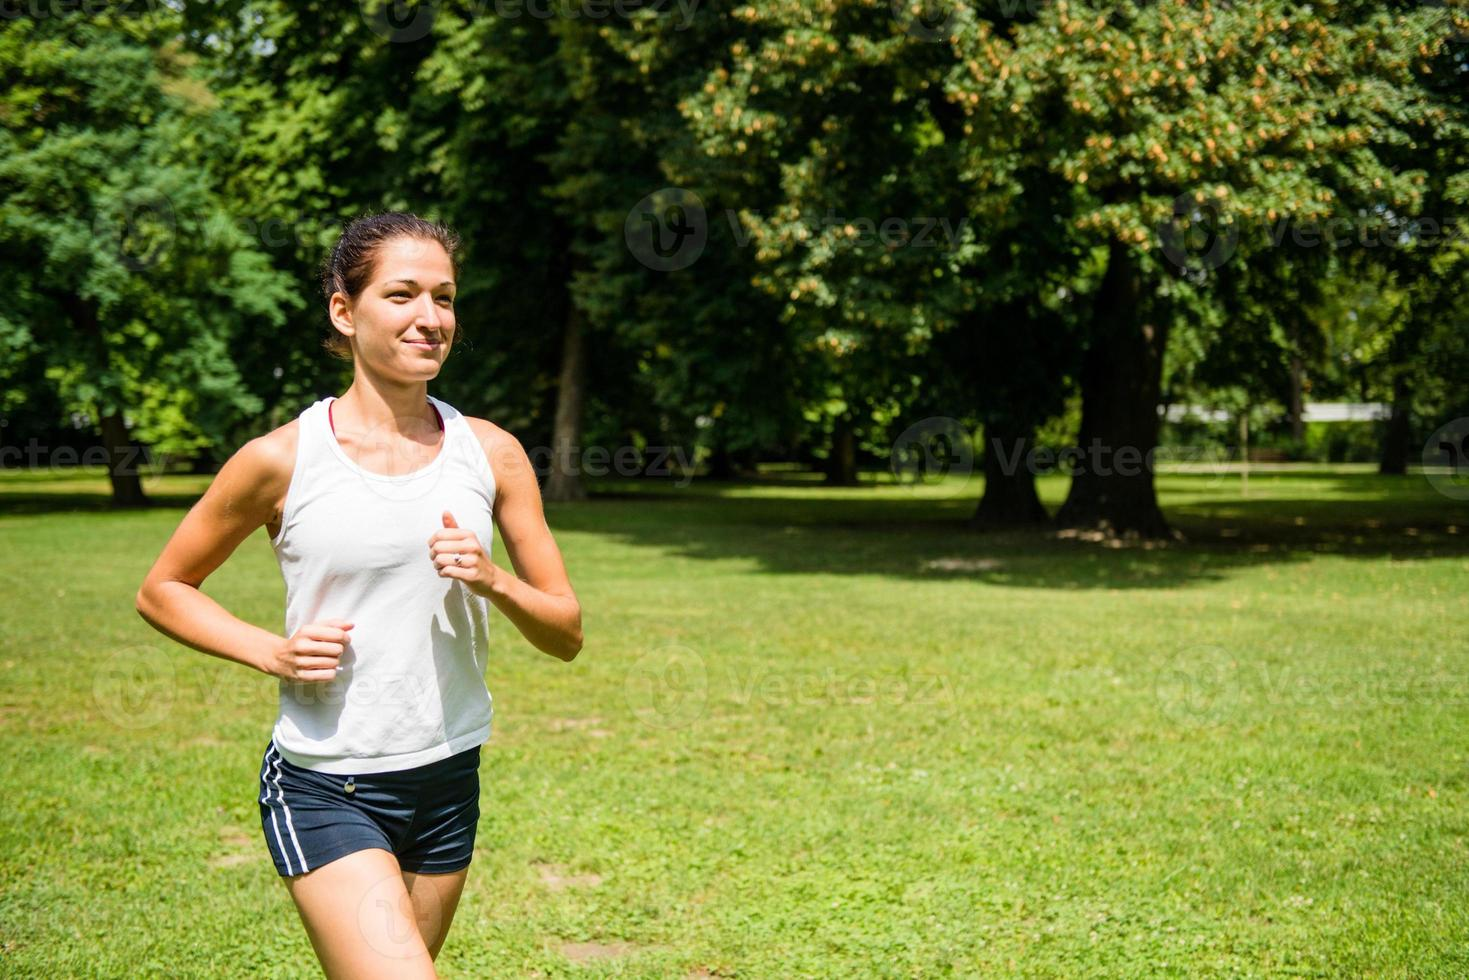 corrida - mulher correndo na natureza foto